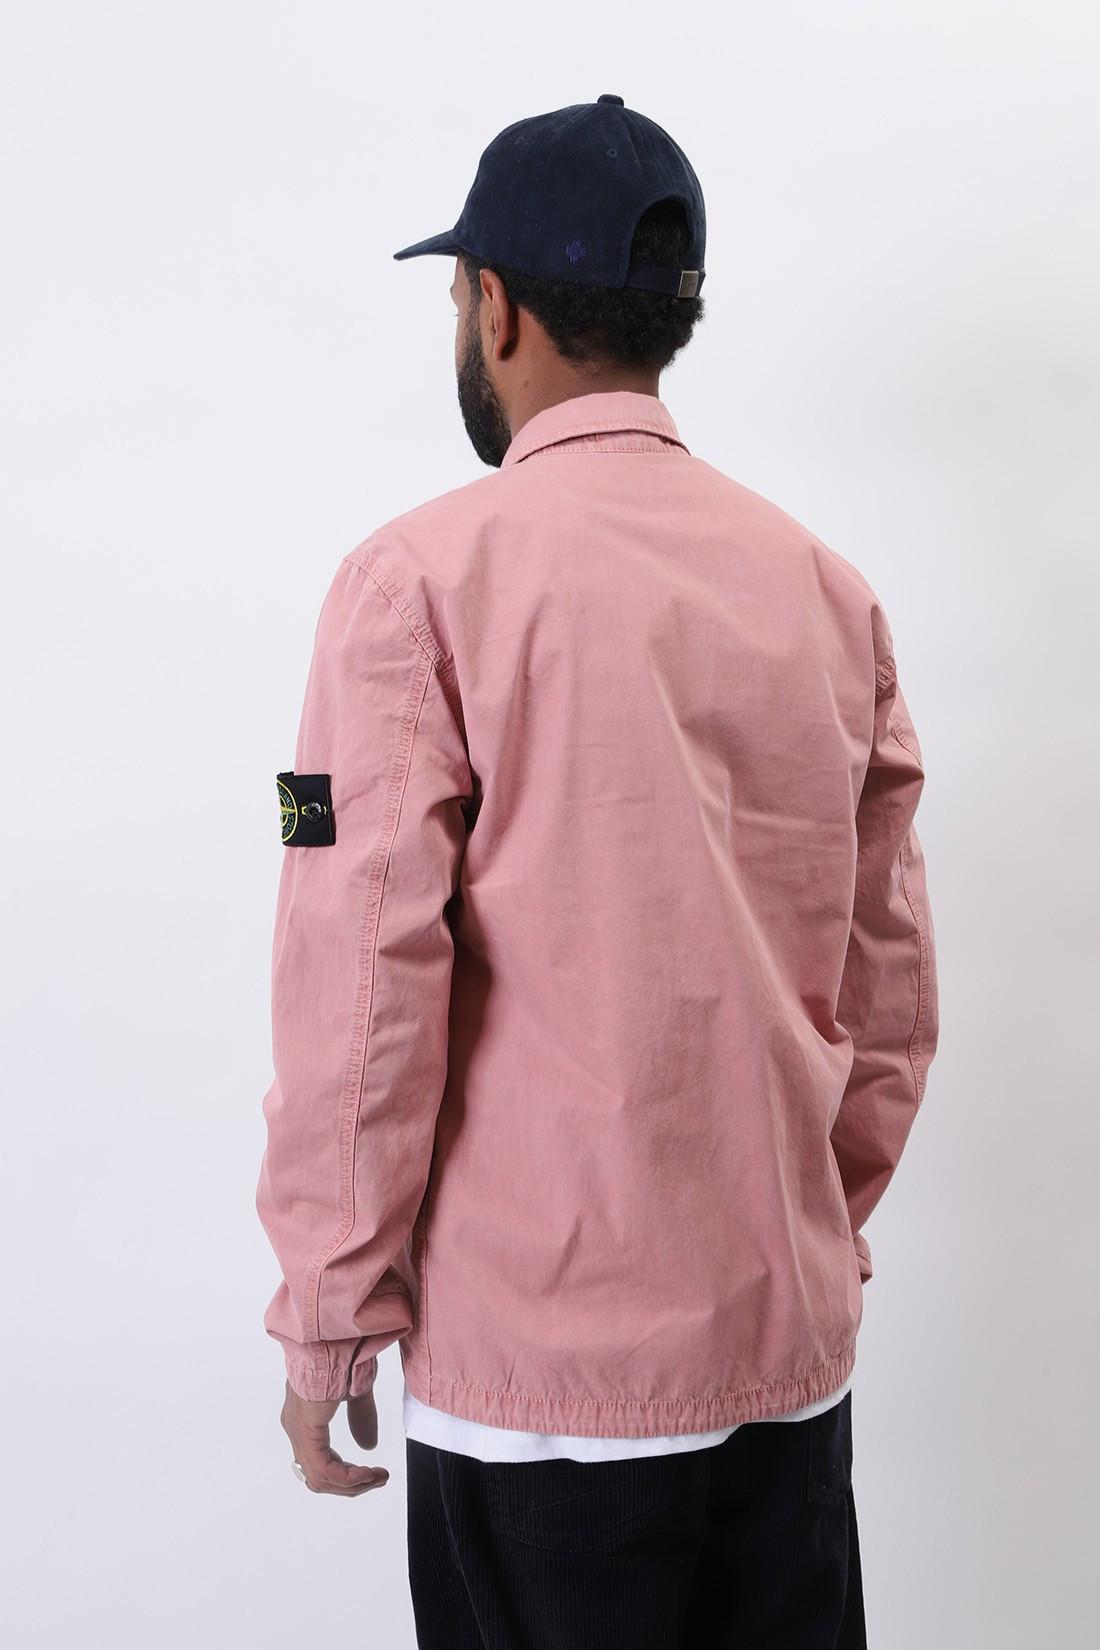 STONE ISLAND / 117wn overshirt v0186 Rosa quarzo